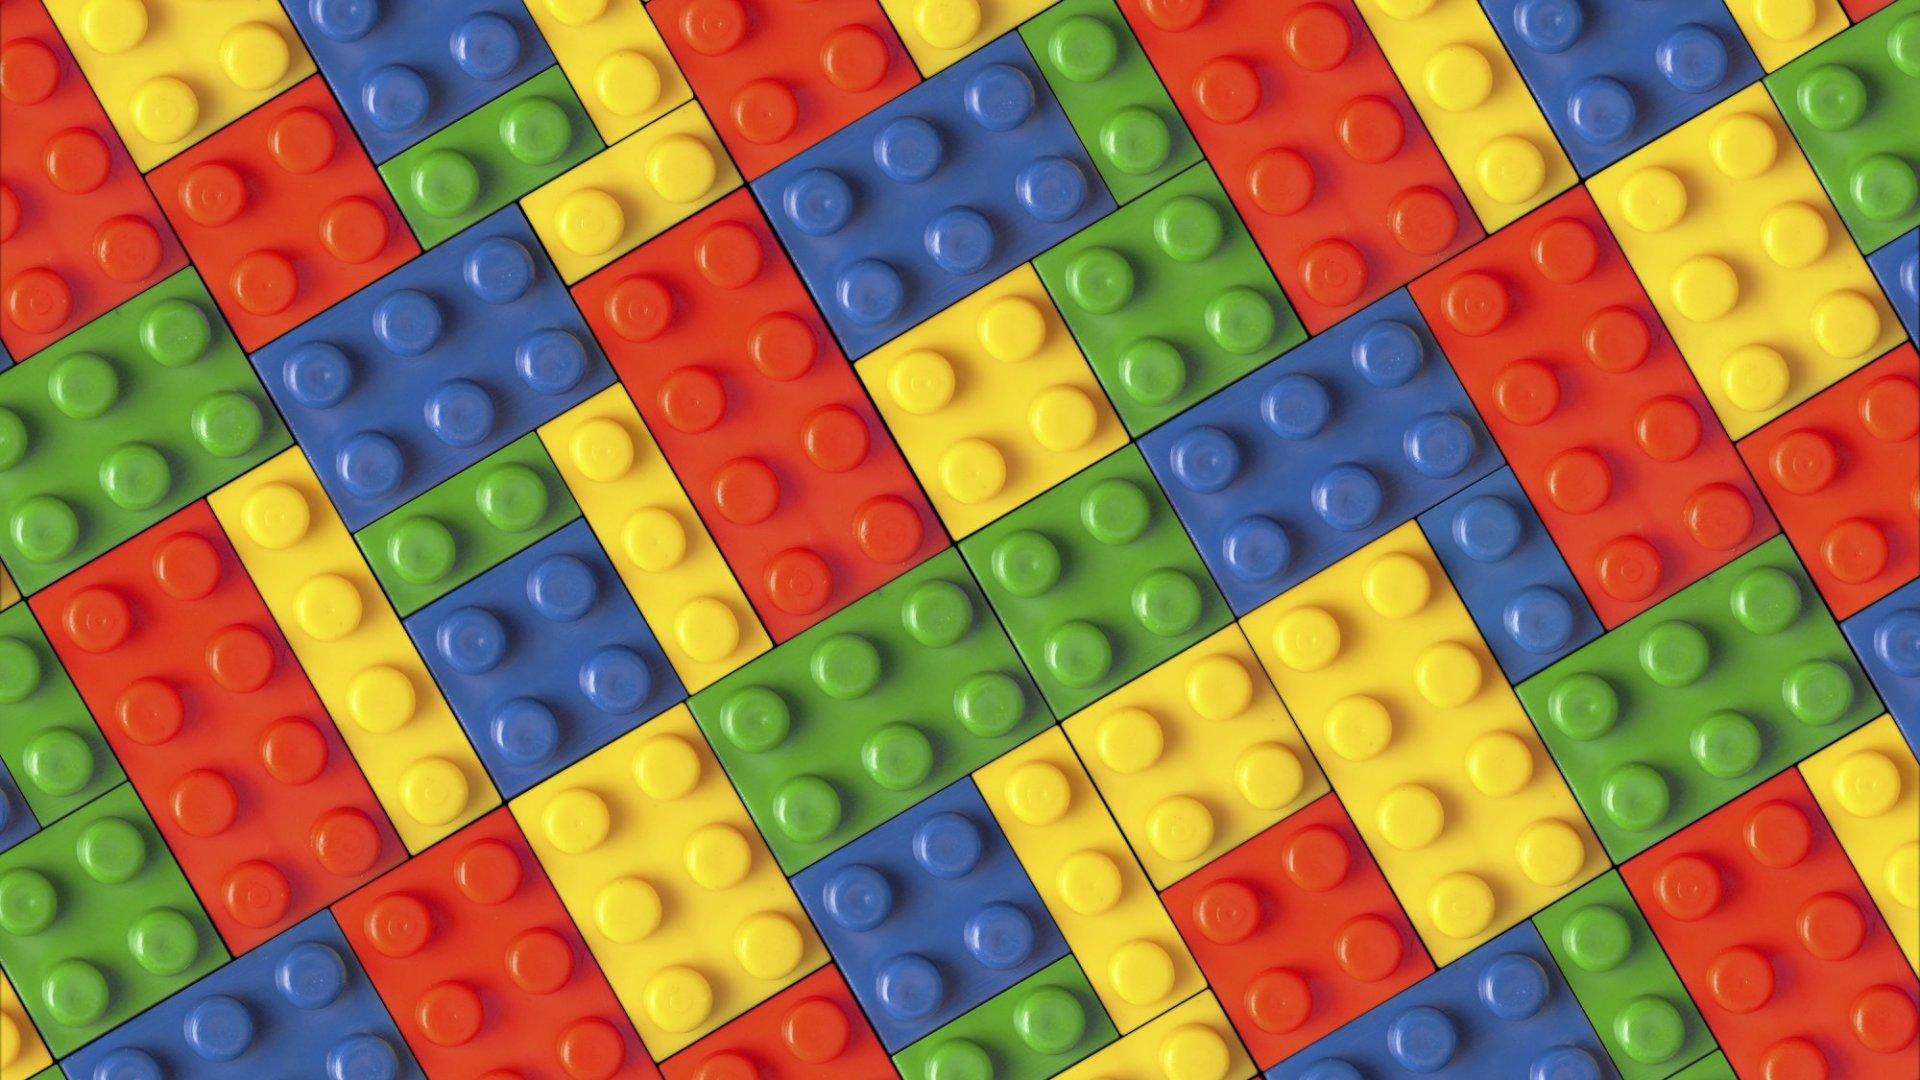 Lego toy building bricks.